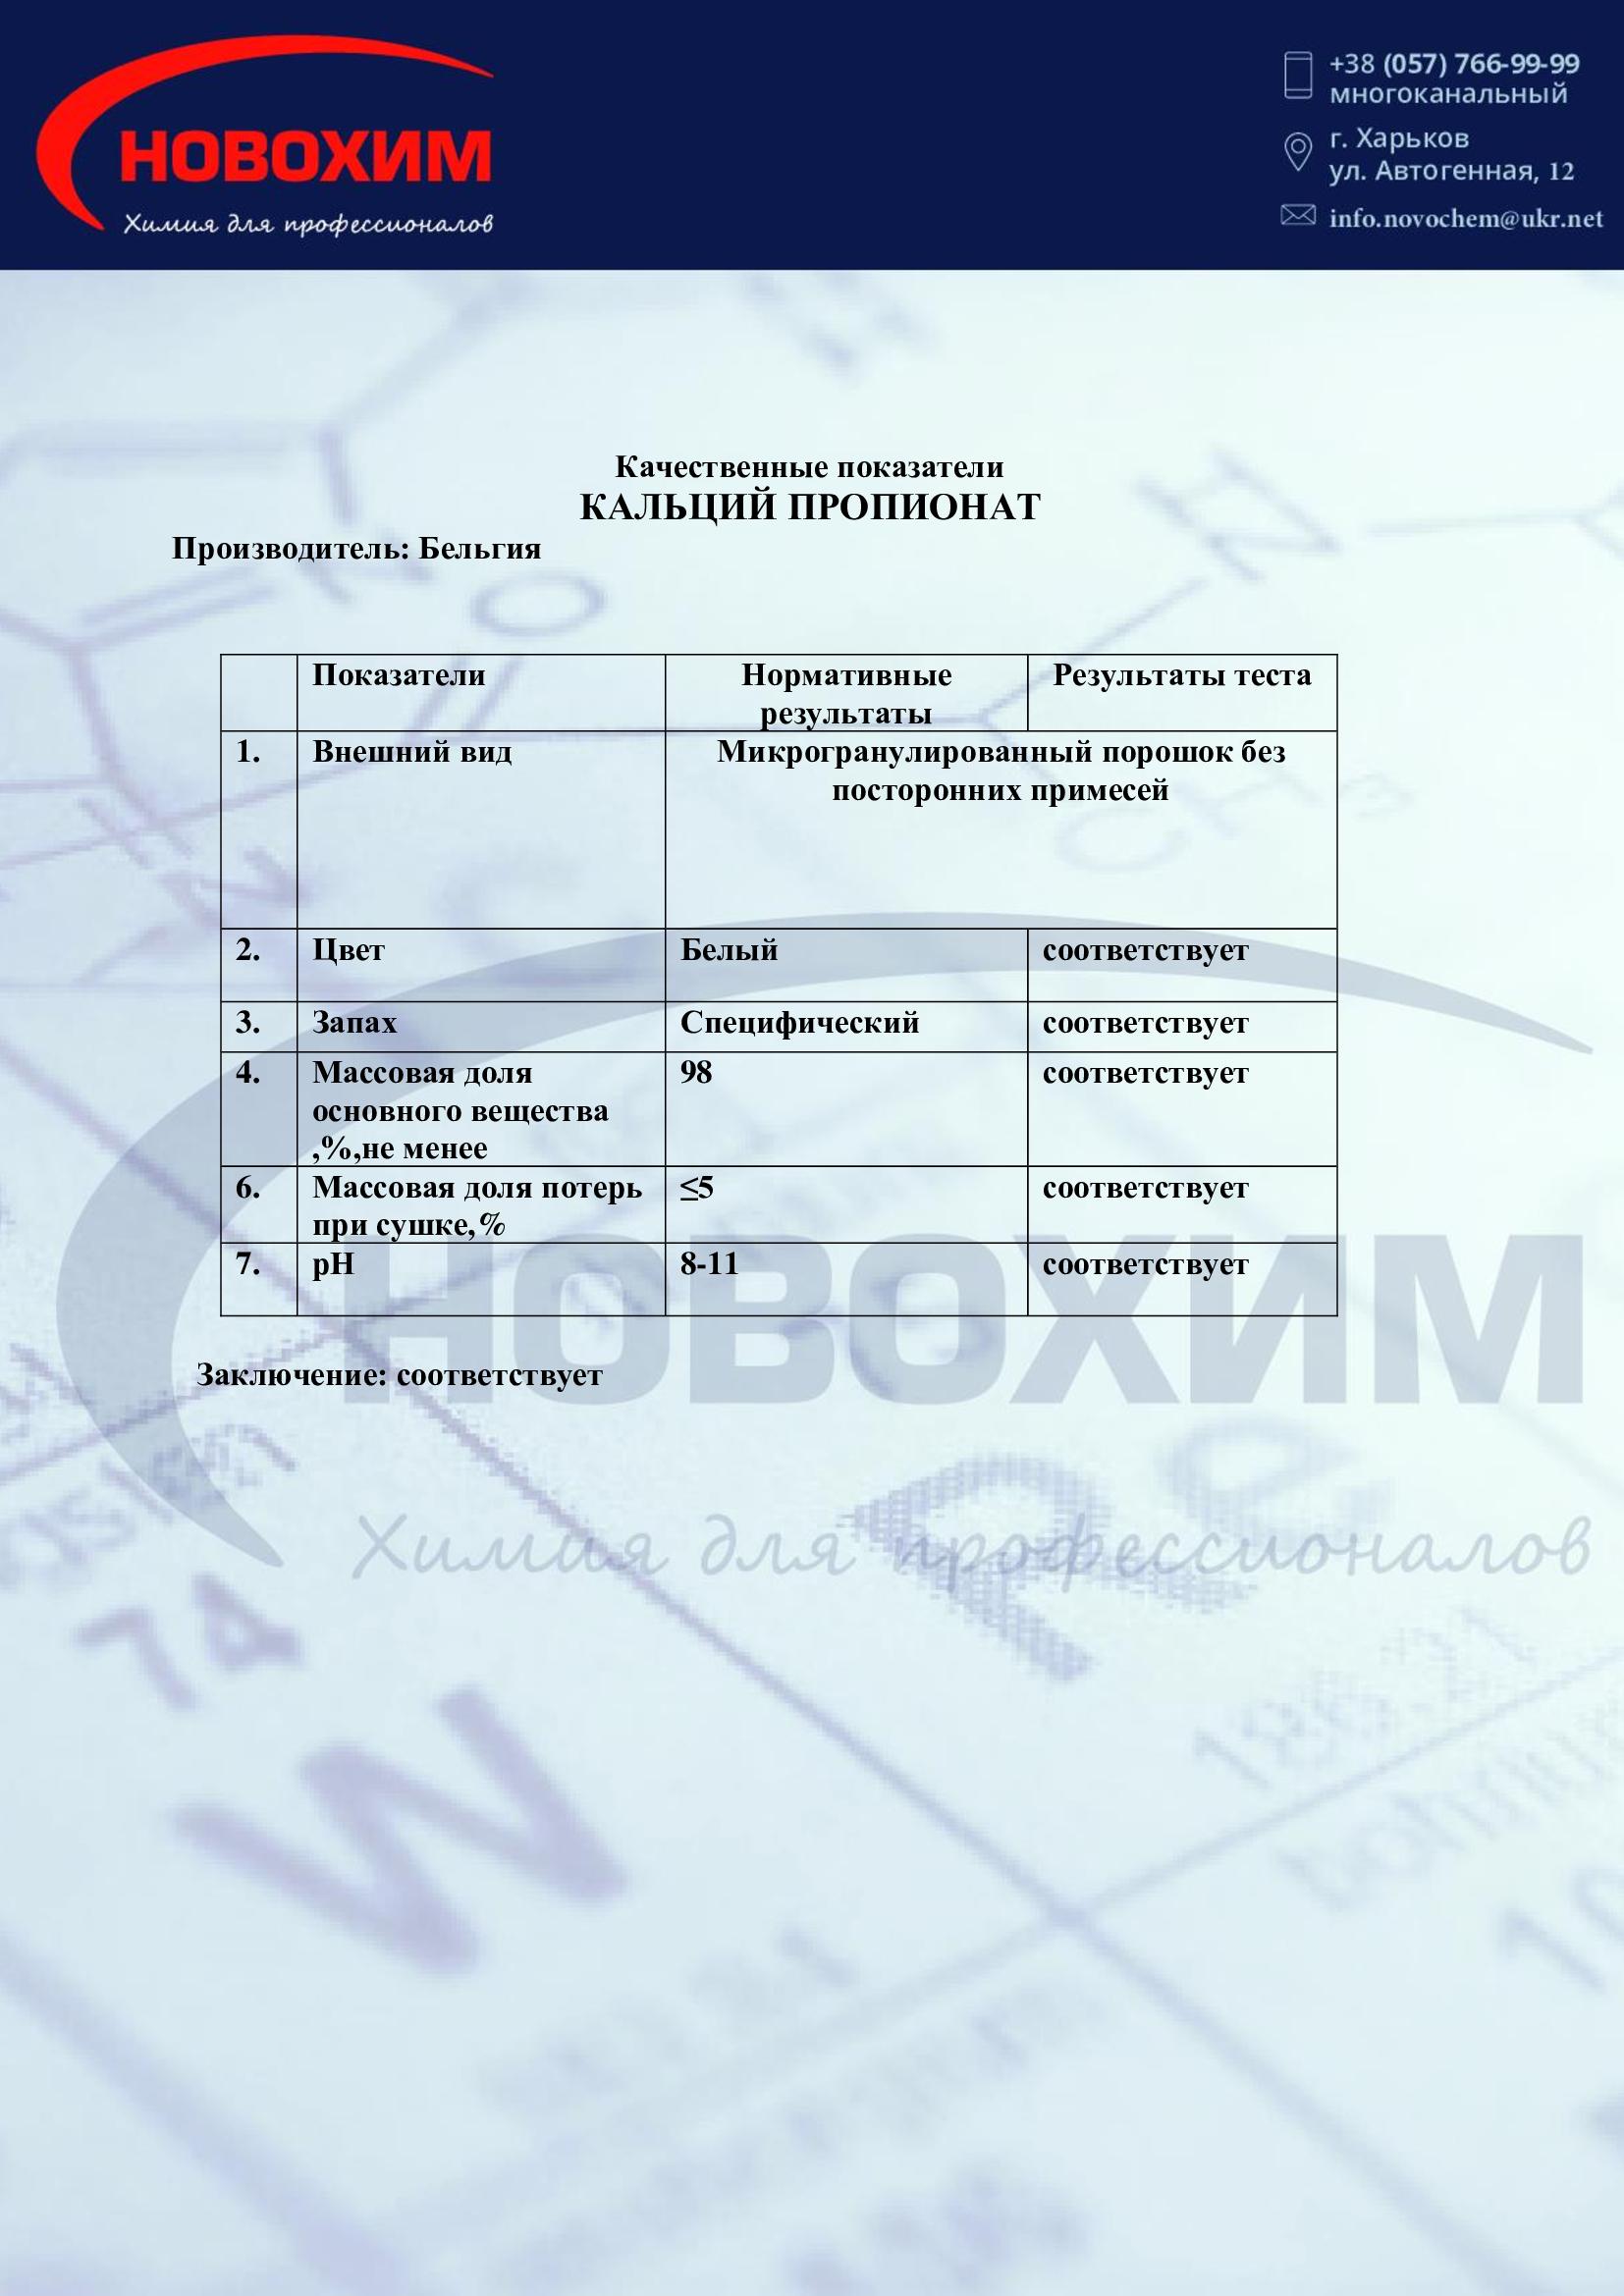 Фото сертификата пропионат кальция